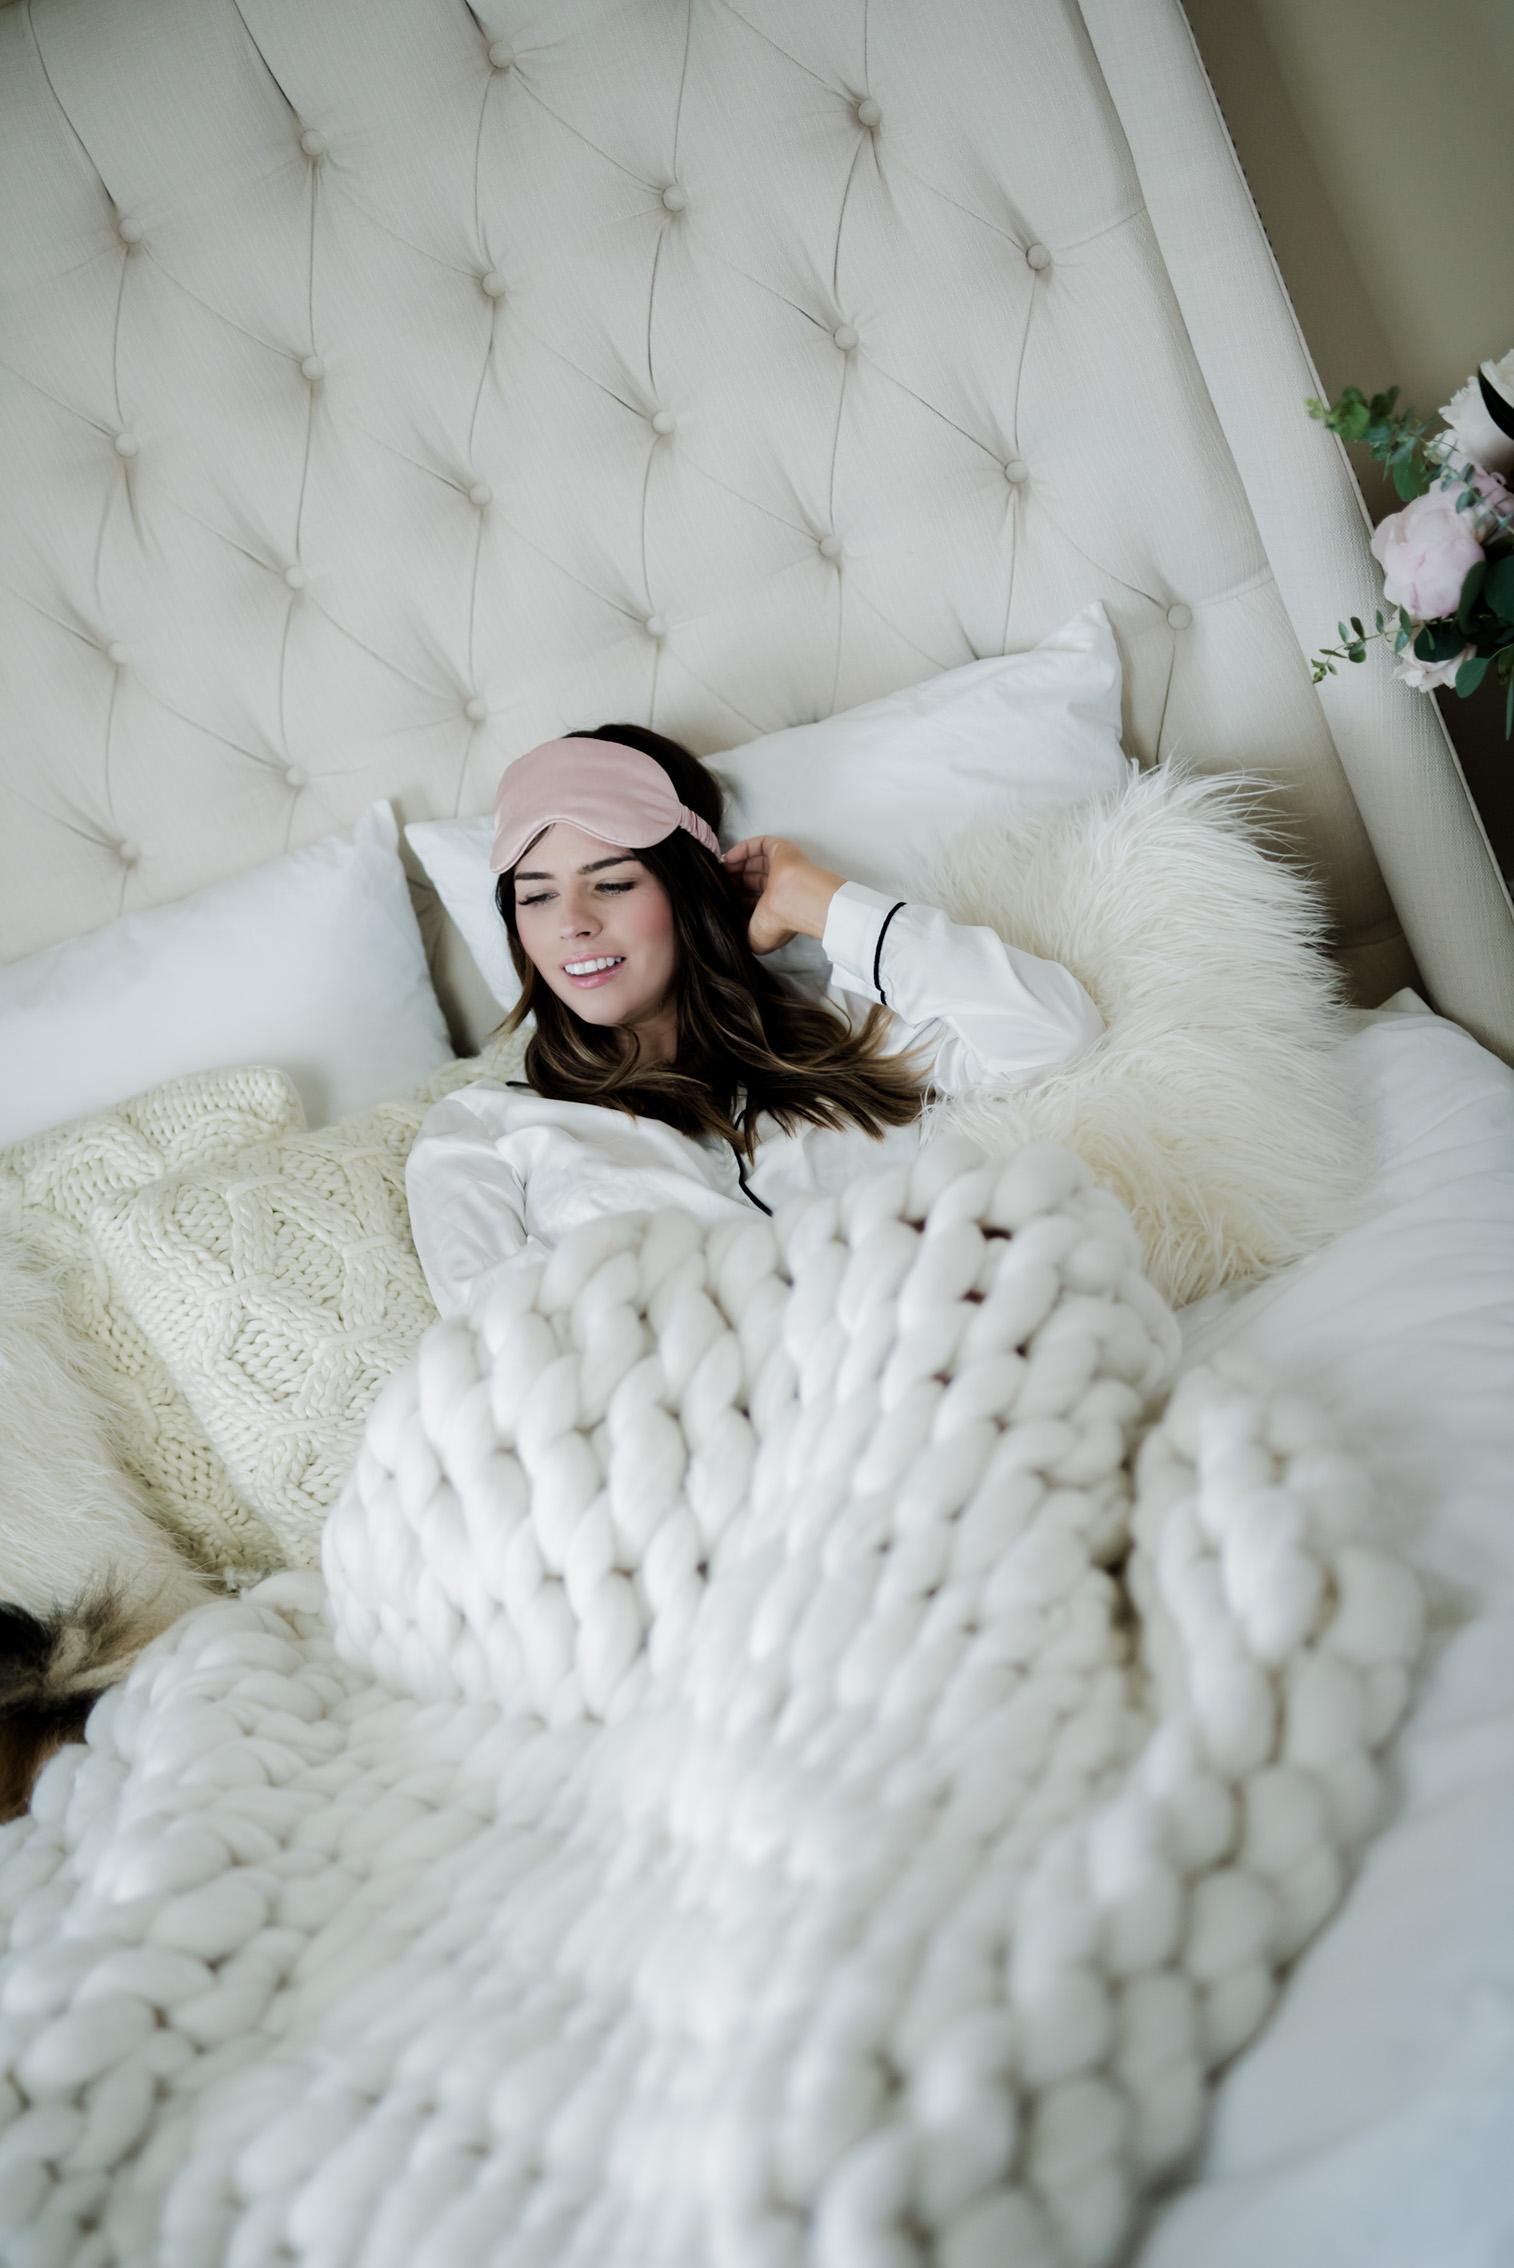 Tiffany Jais Houston fashion and lifestyle blogger | Lull mattress, chunky wool knit blanket for under 100